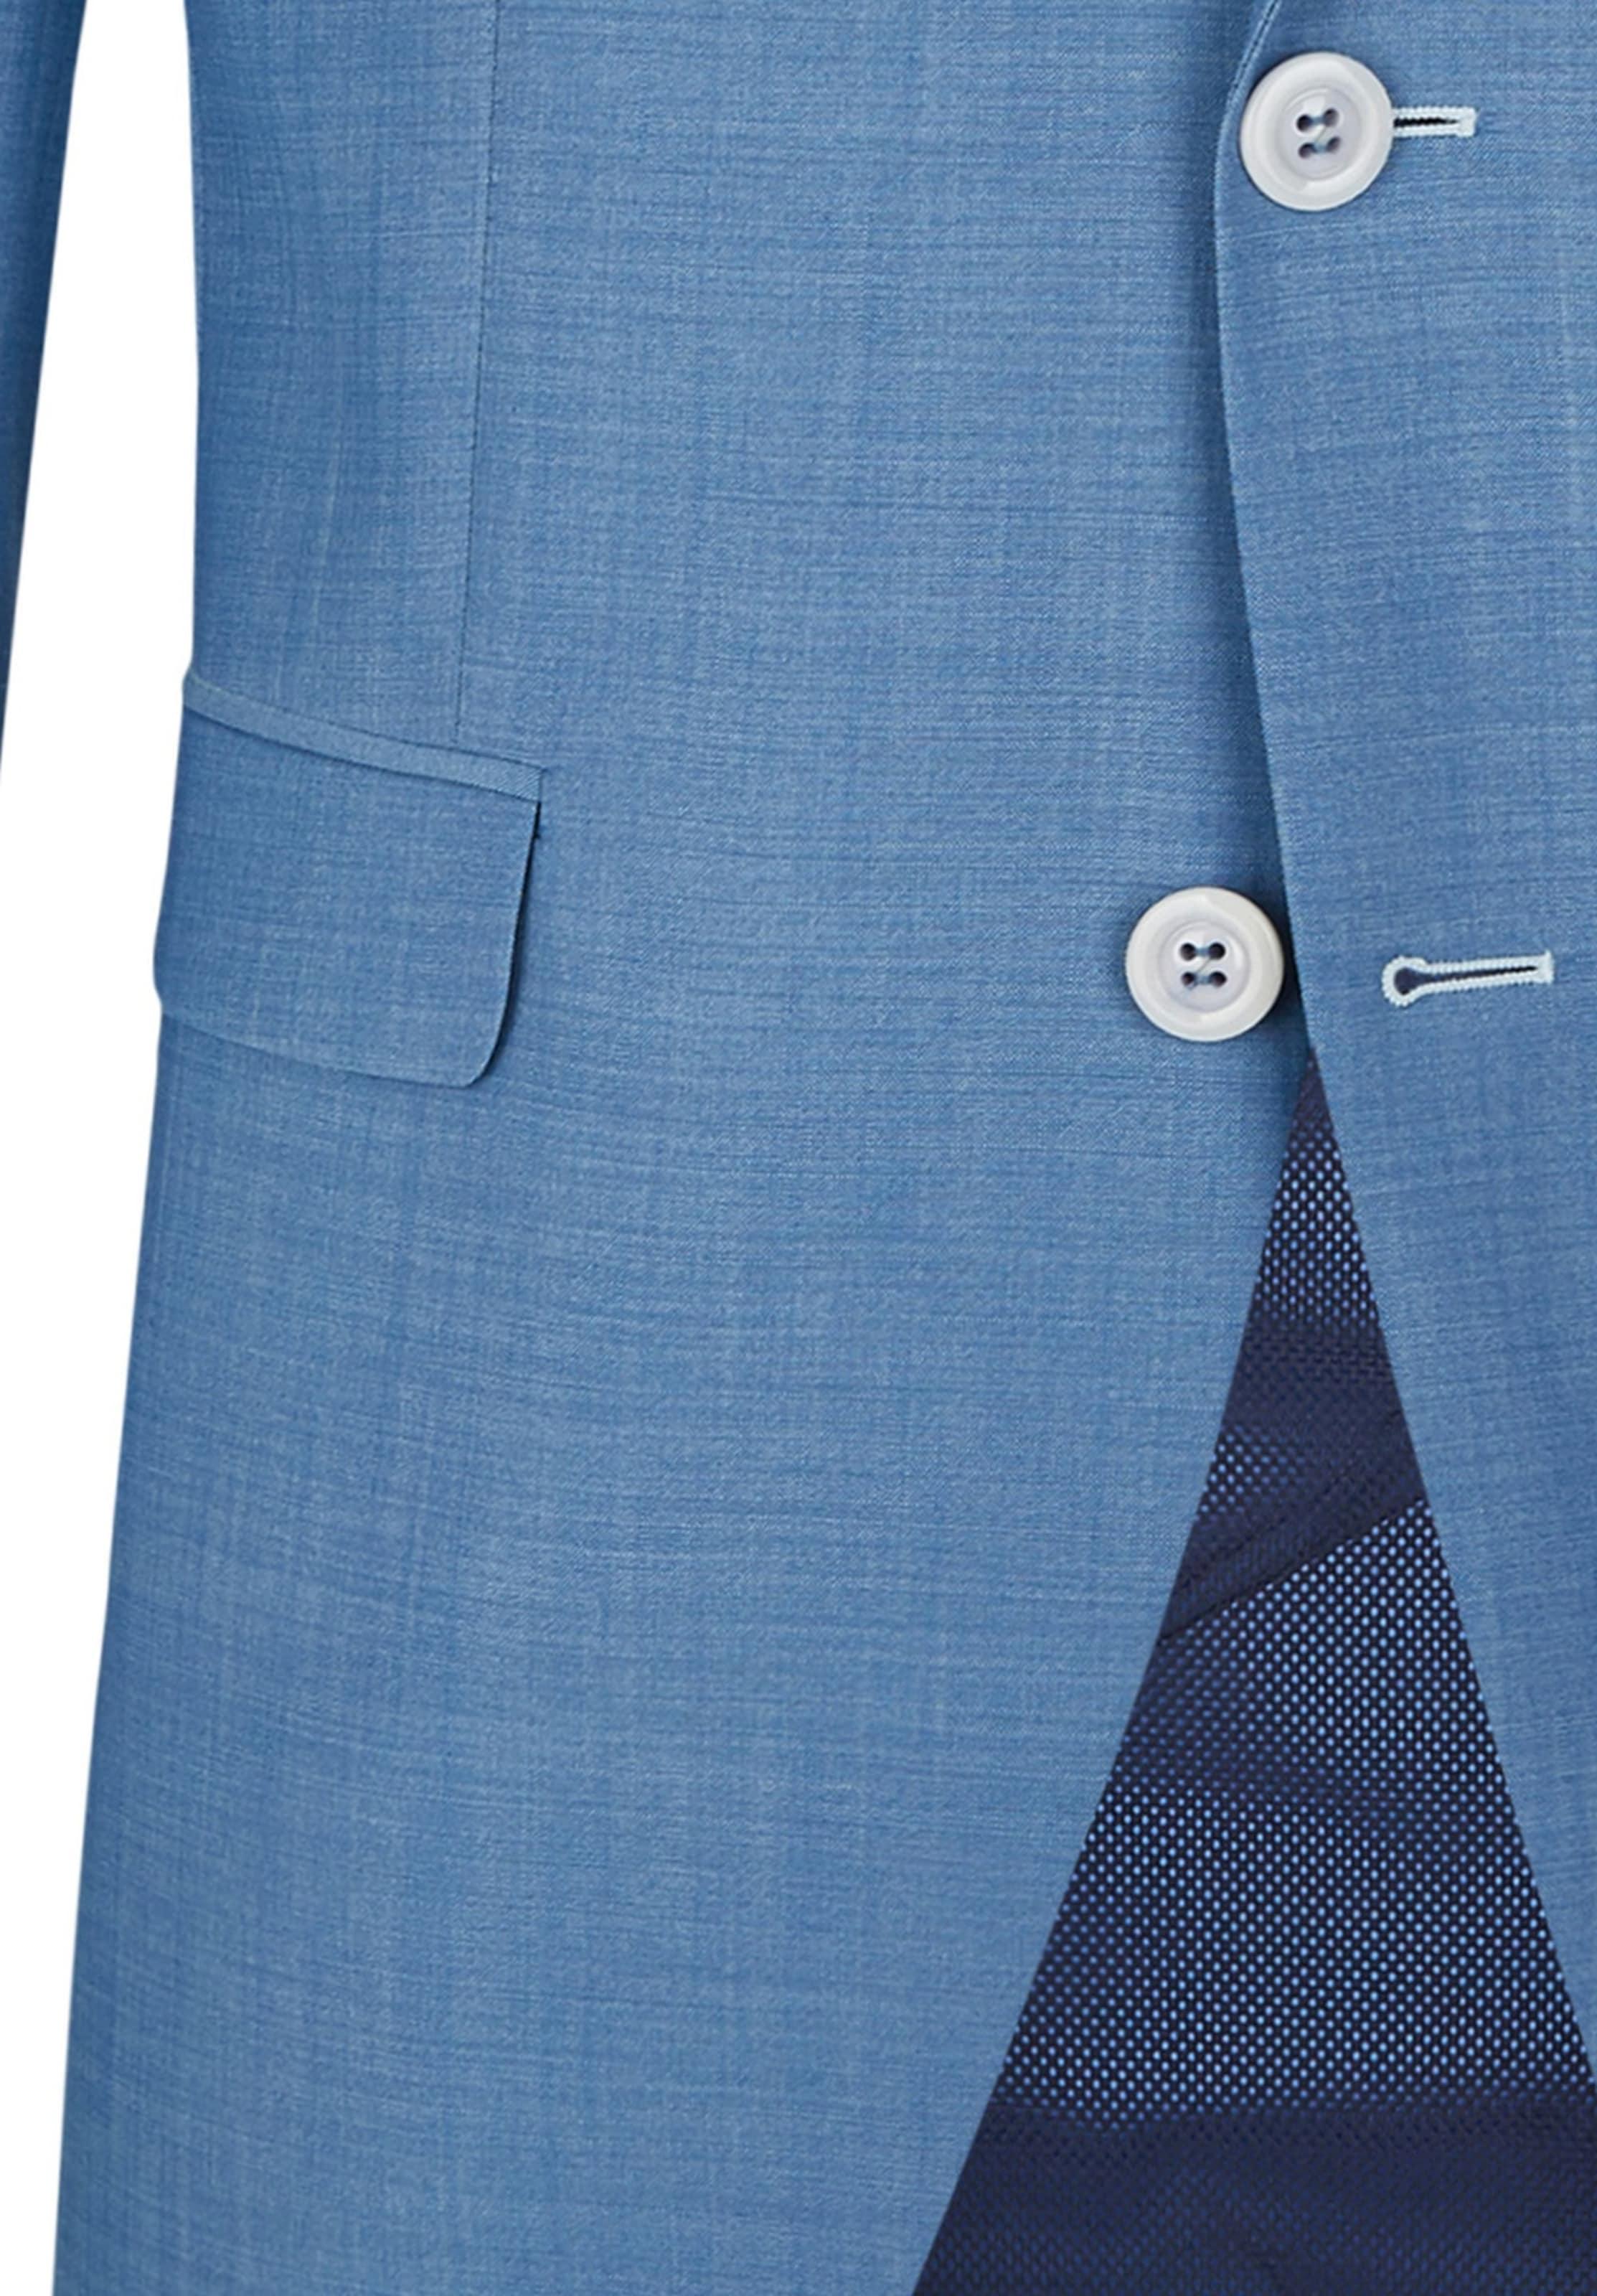 Hechter Hellblau Wear' Sakko 'smart In Daniel HbDIeWYE29